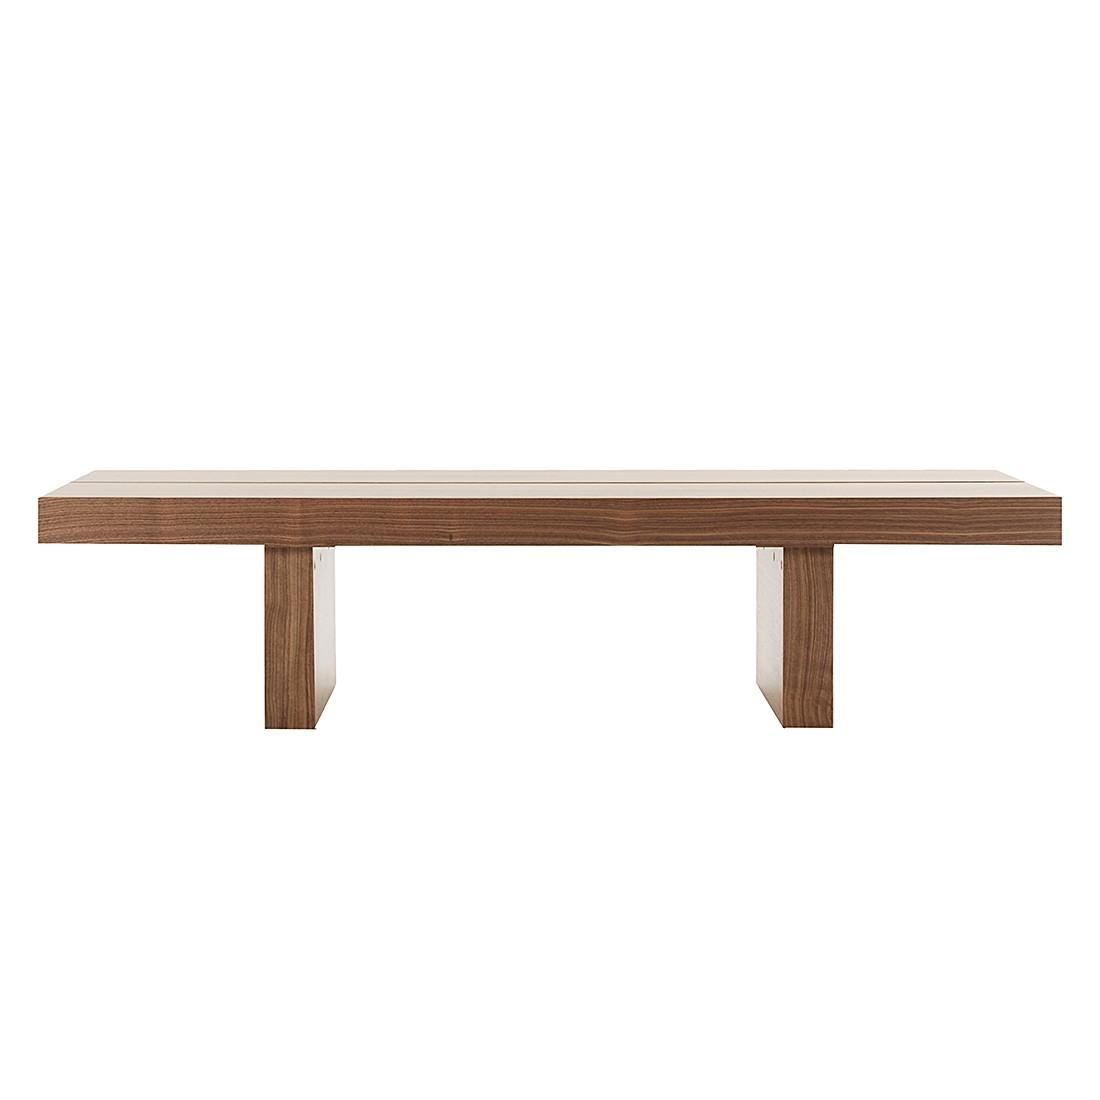 Table Basse Design Class Transparente – Phaichicom -> Petite Table Basse Transparente